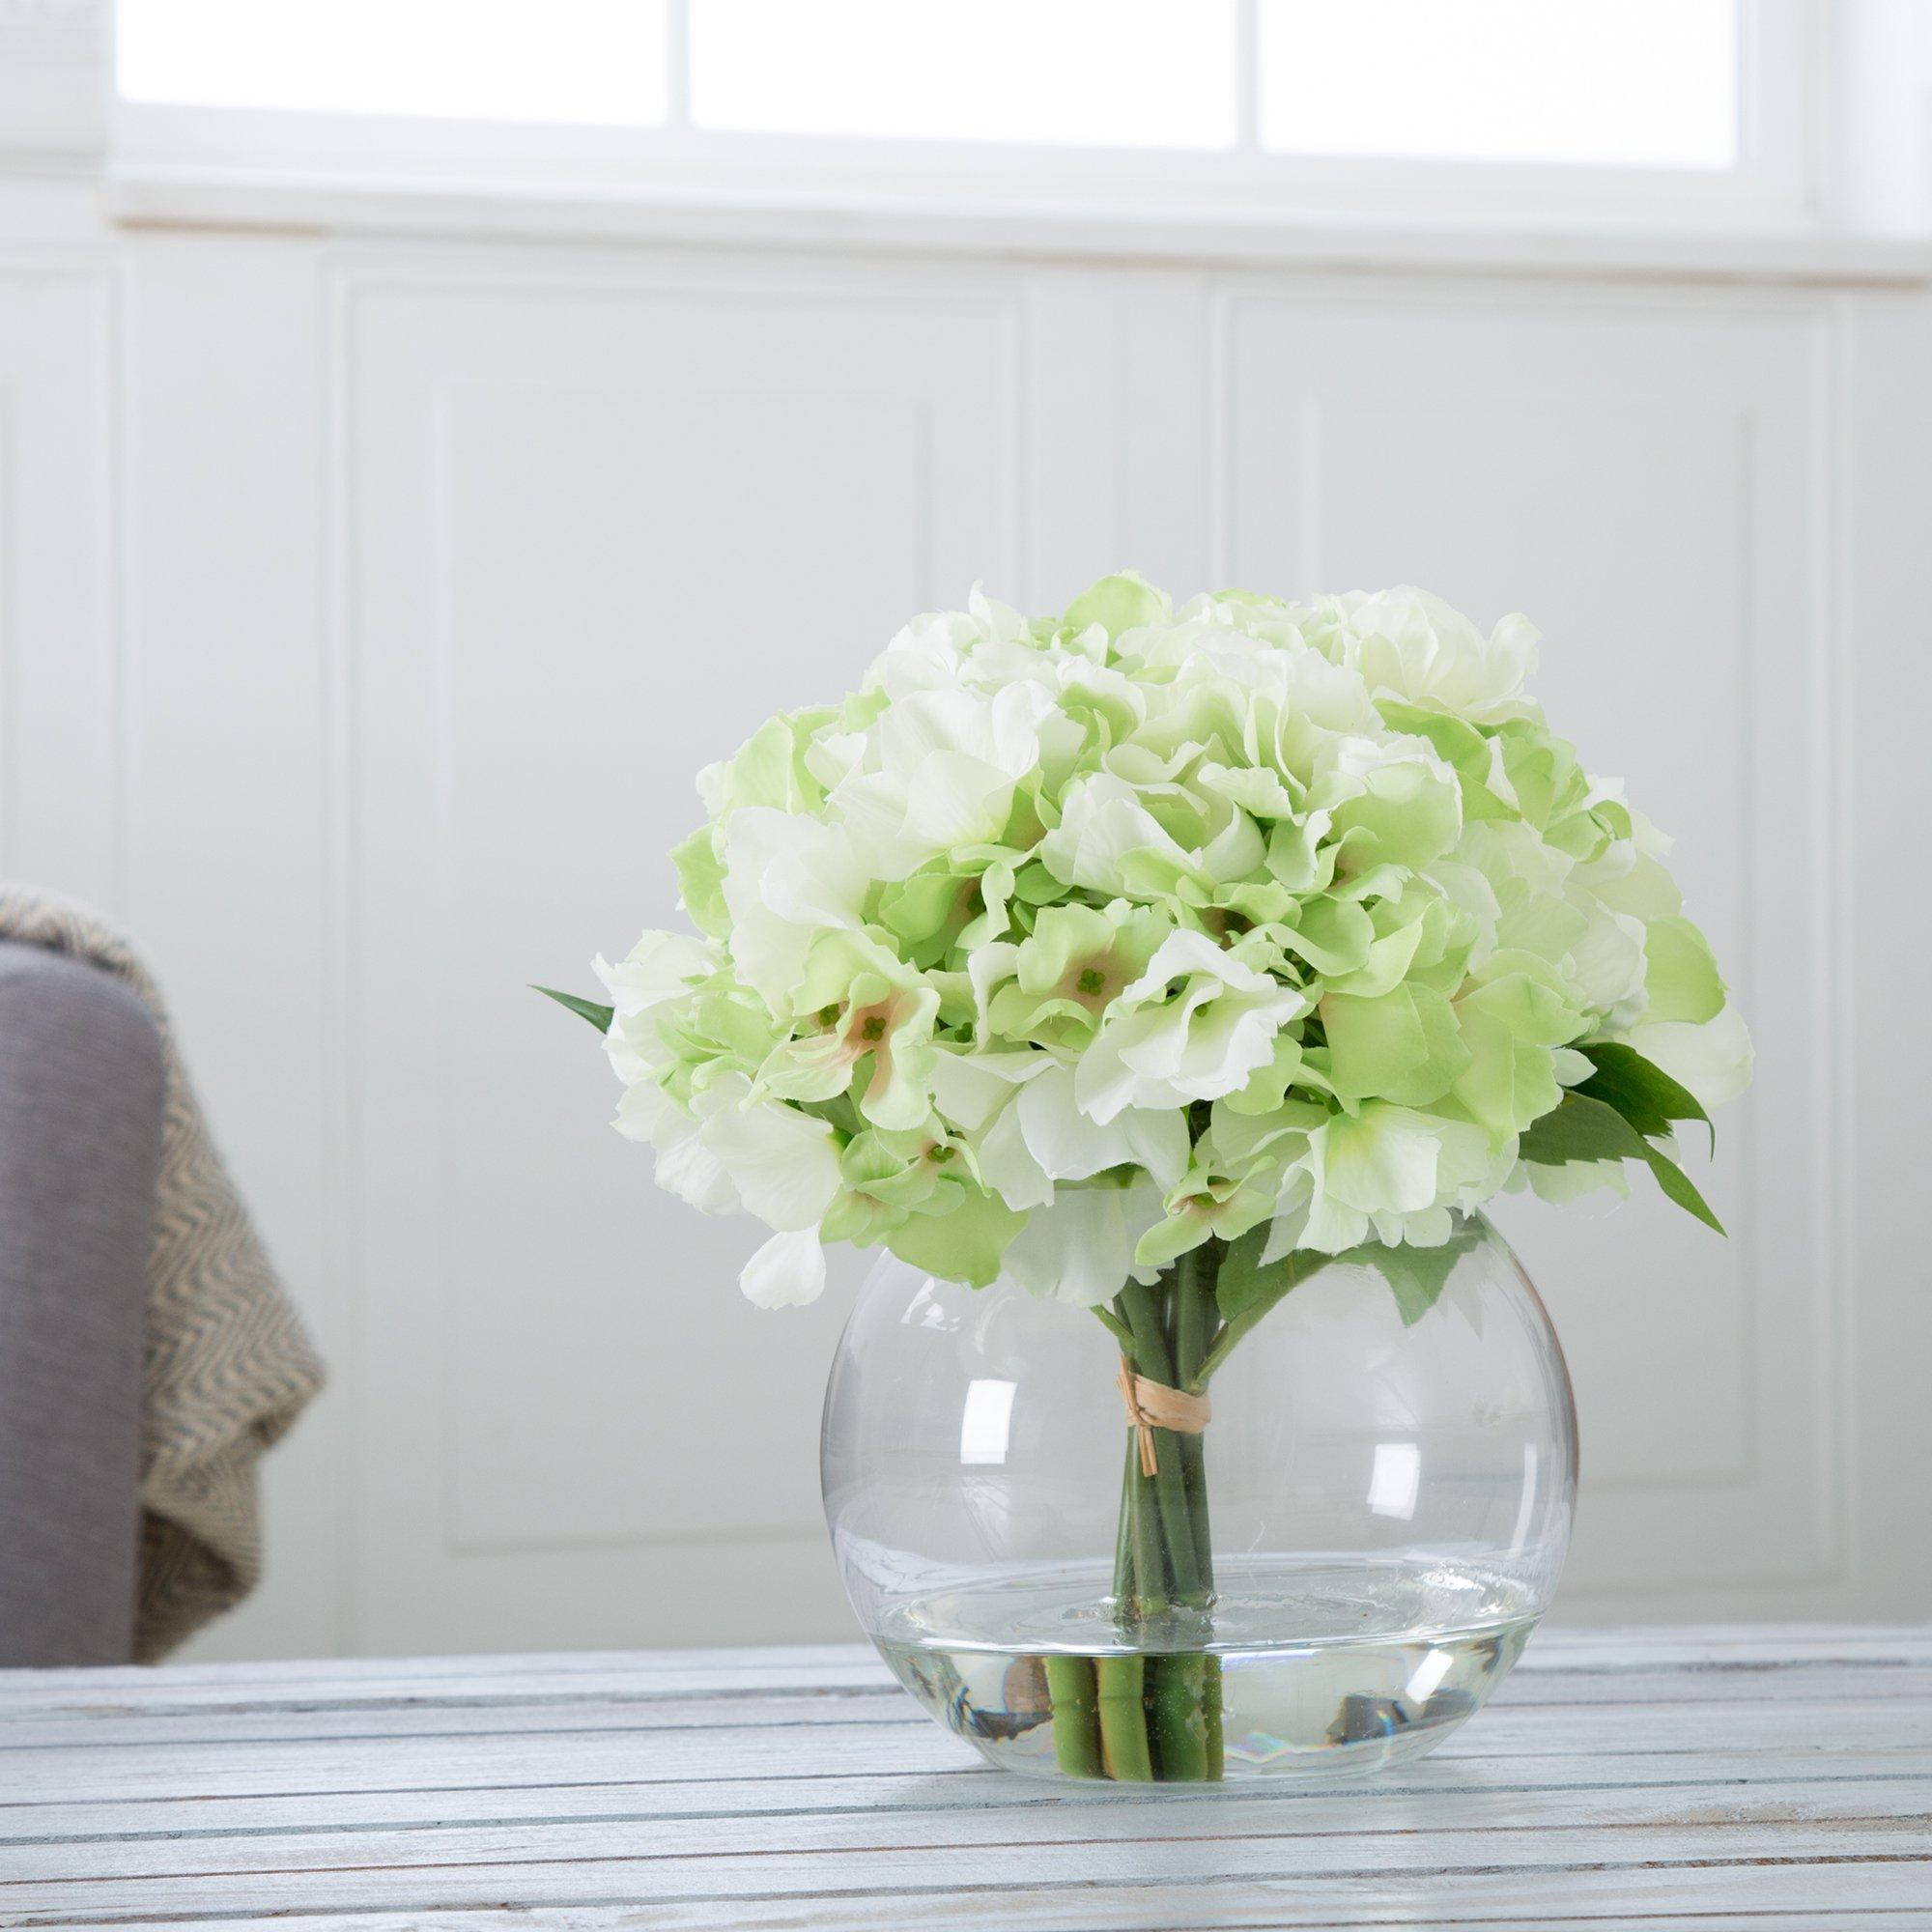 Pure Garden Hydrangea Floral Arrangement with Glass Vase - Green & Small Faux Flower Arrangements with Vase: Amazon.com